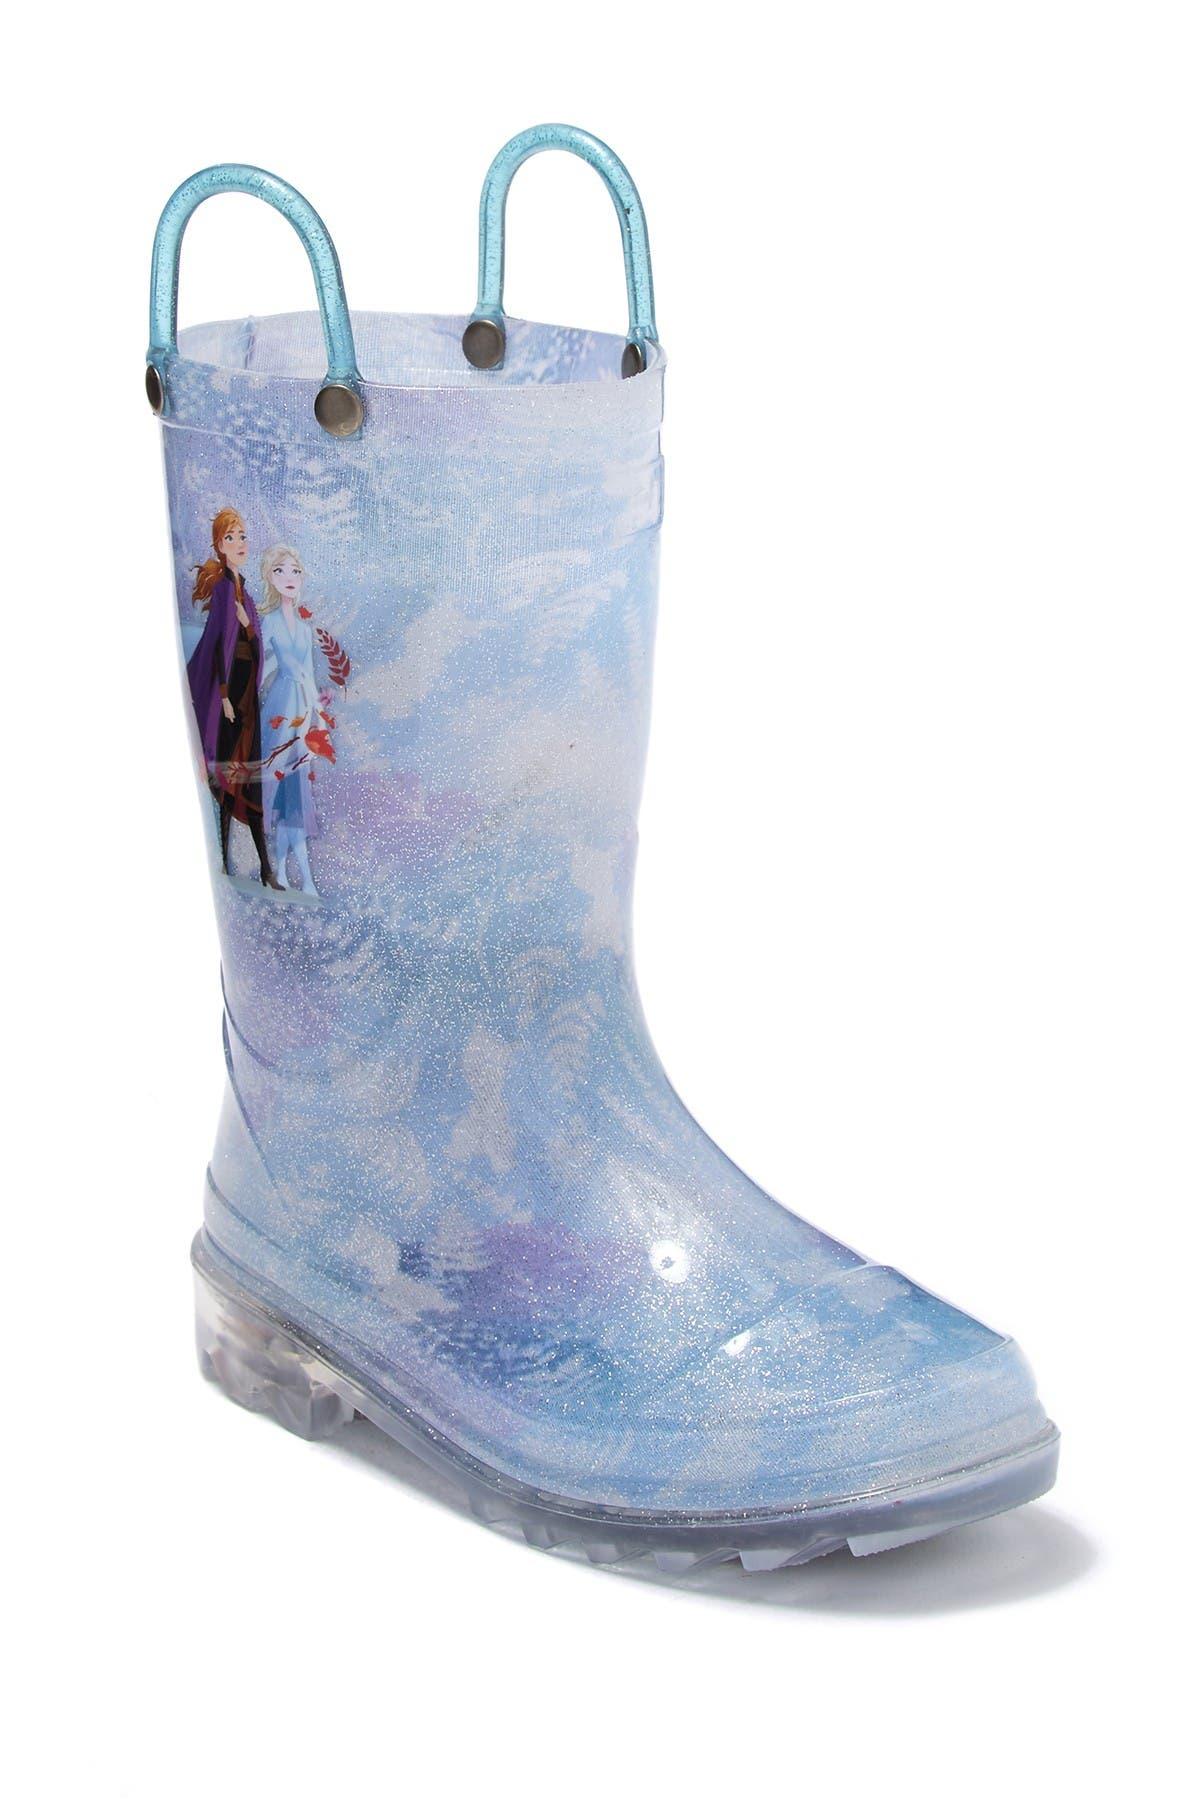 Frozen Northern Myth Light Up Rain Boot